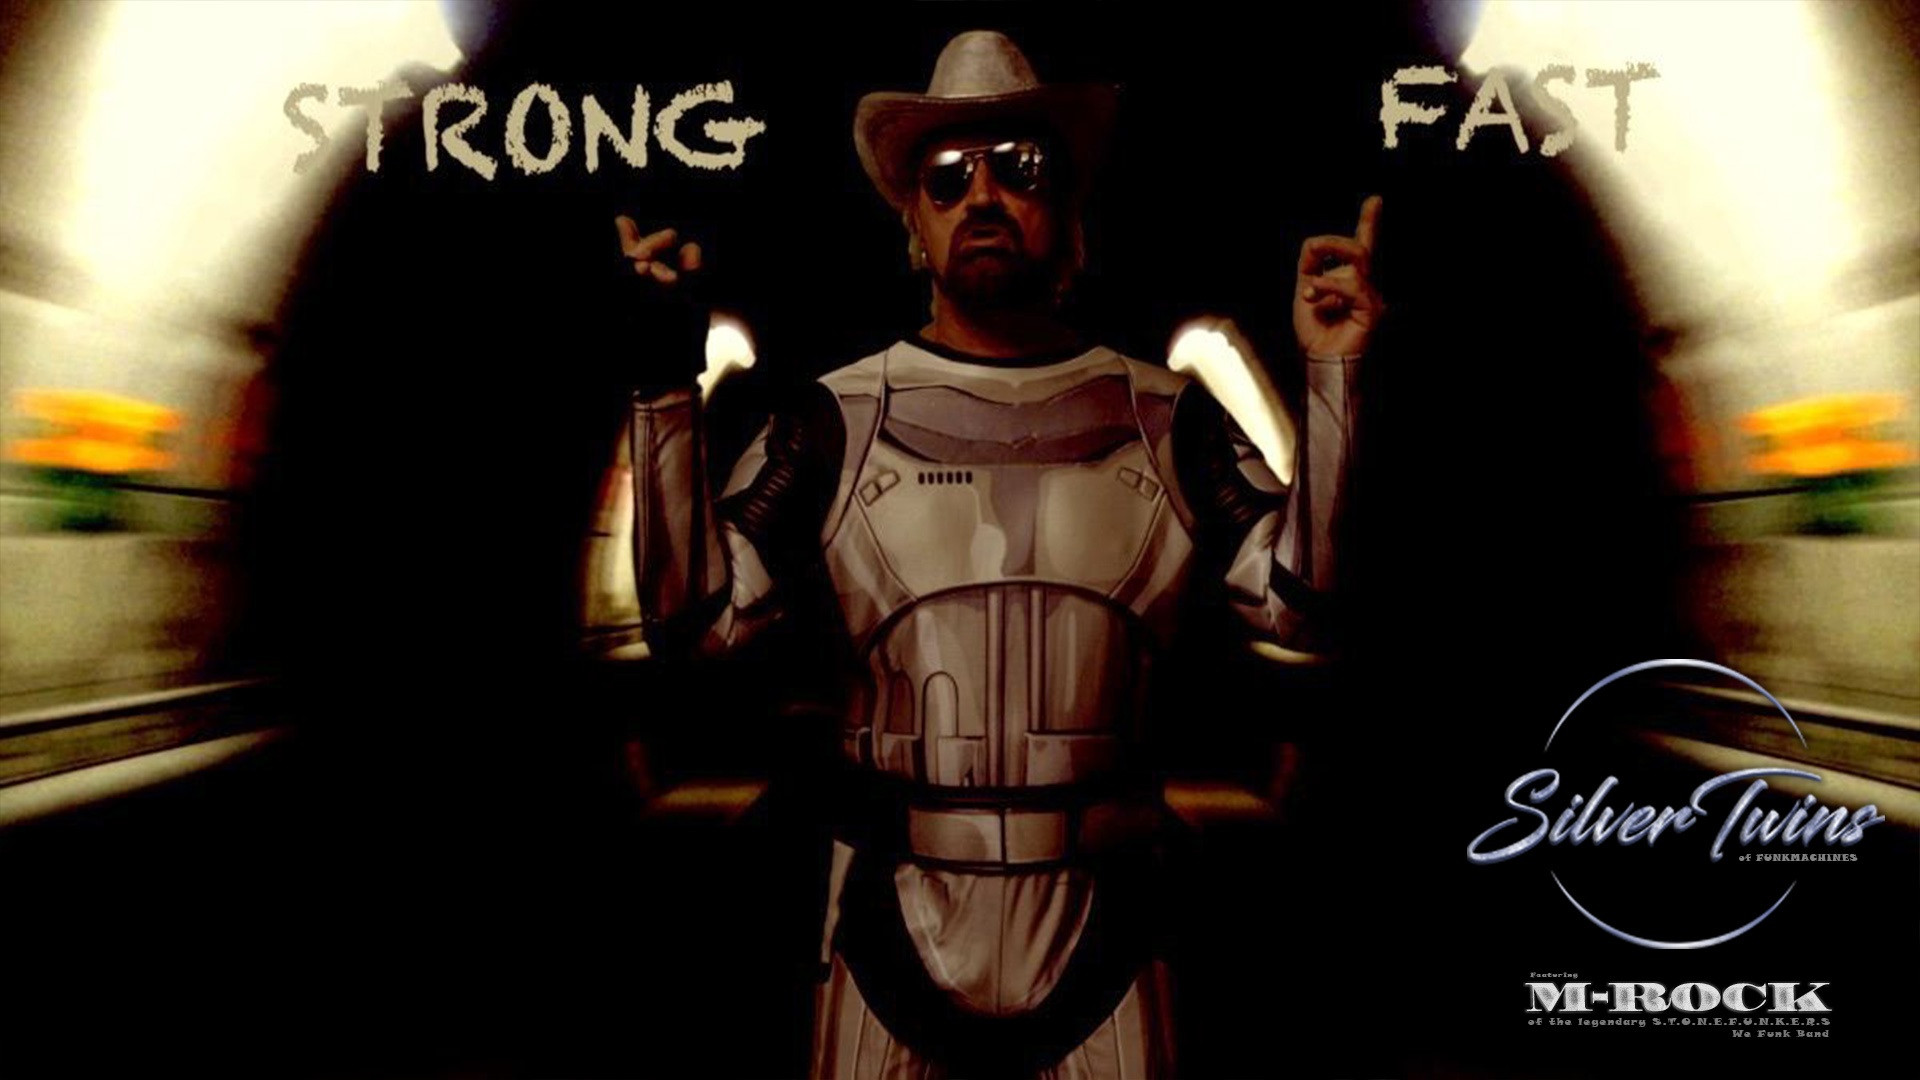 Time SilverTwins of funk EMRIK STRING FA